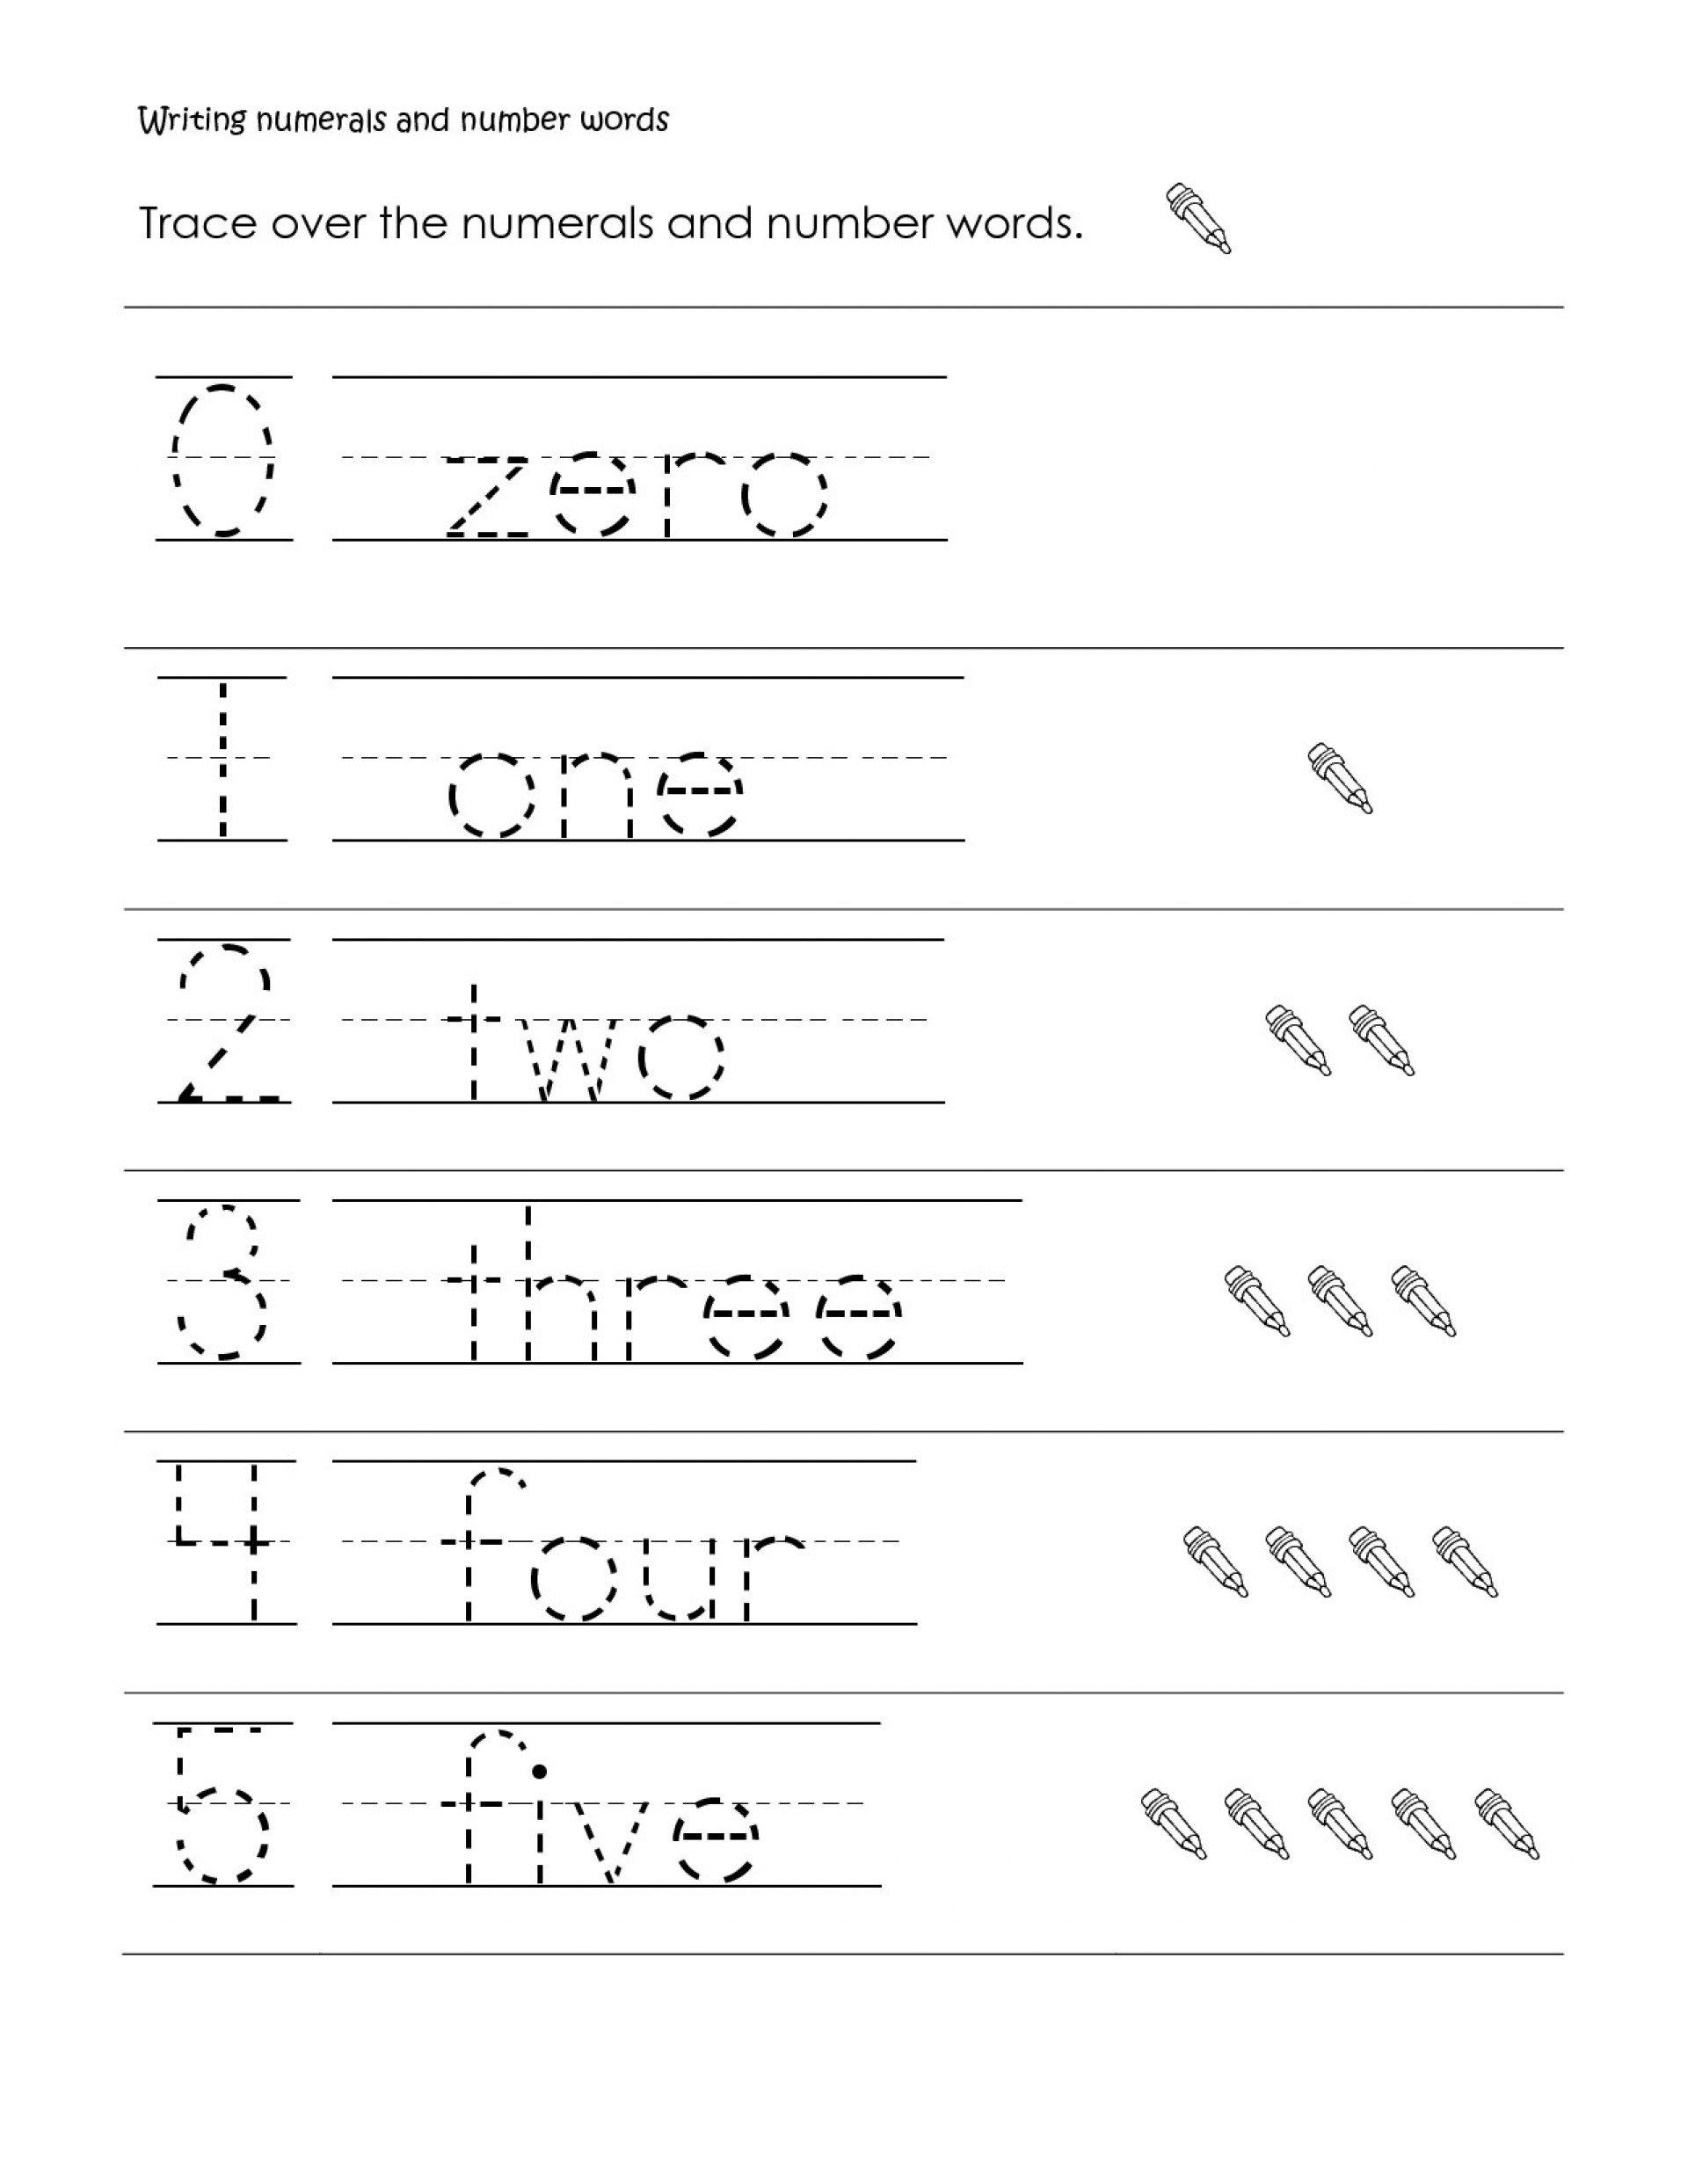 037 Blank Handwriting Worksheets For Kindergarten Relaxingnights Together With Kindergarten Writing Worksheets Pdf